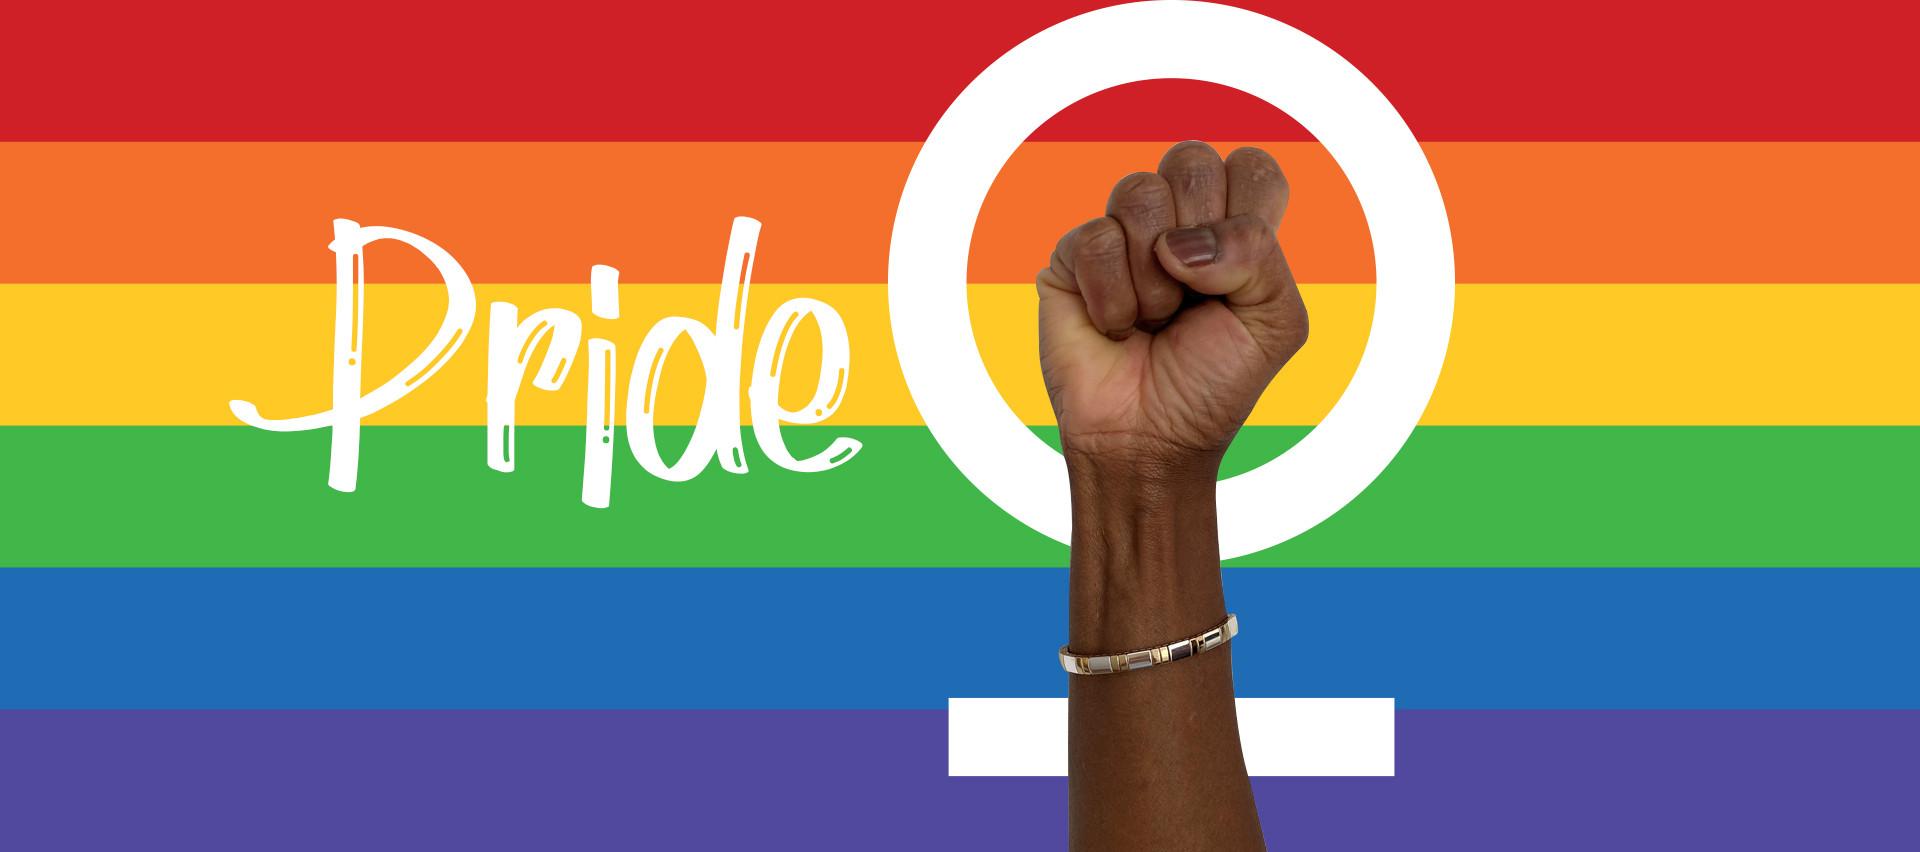 Pride Faixa.jpg